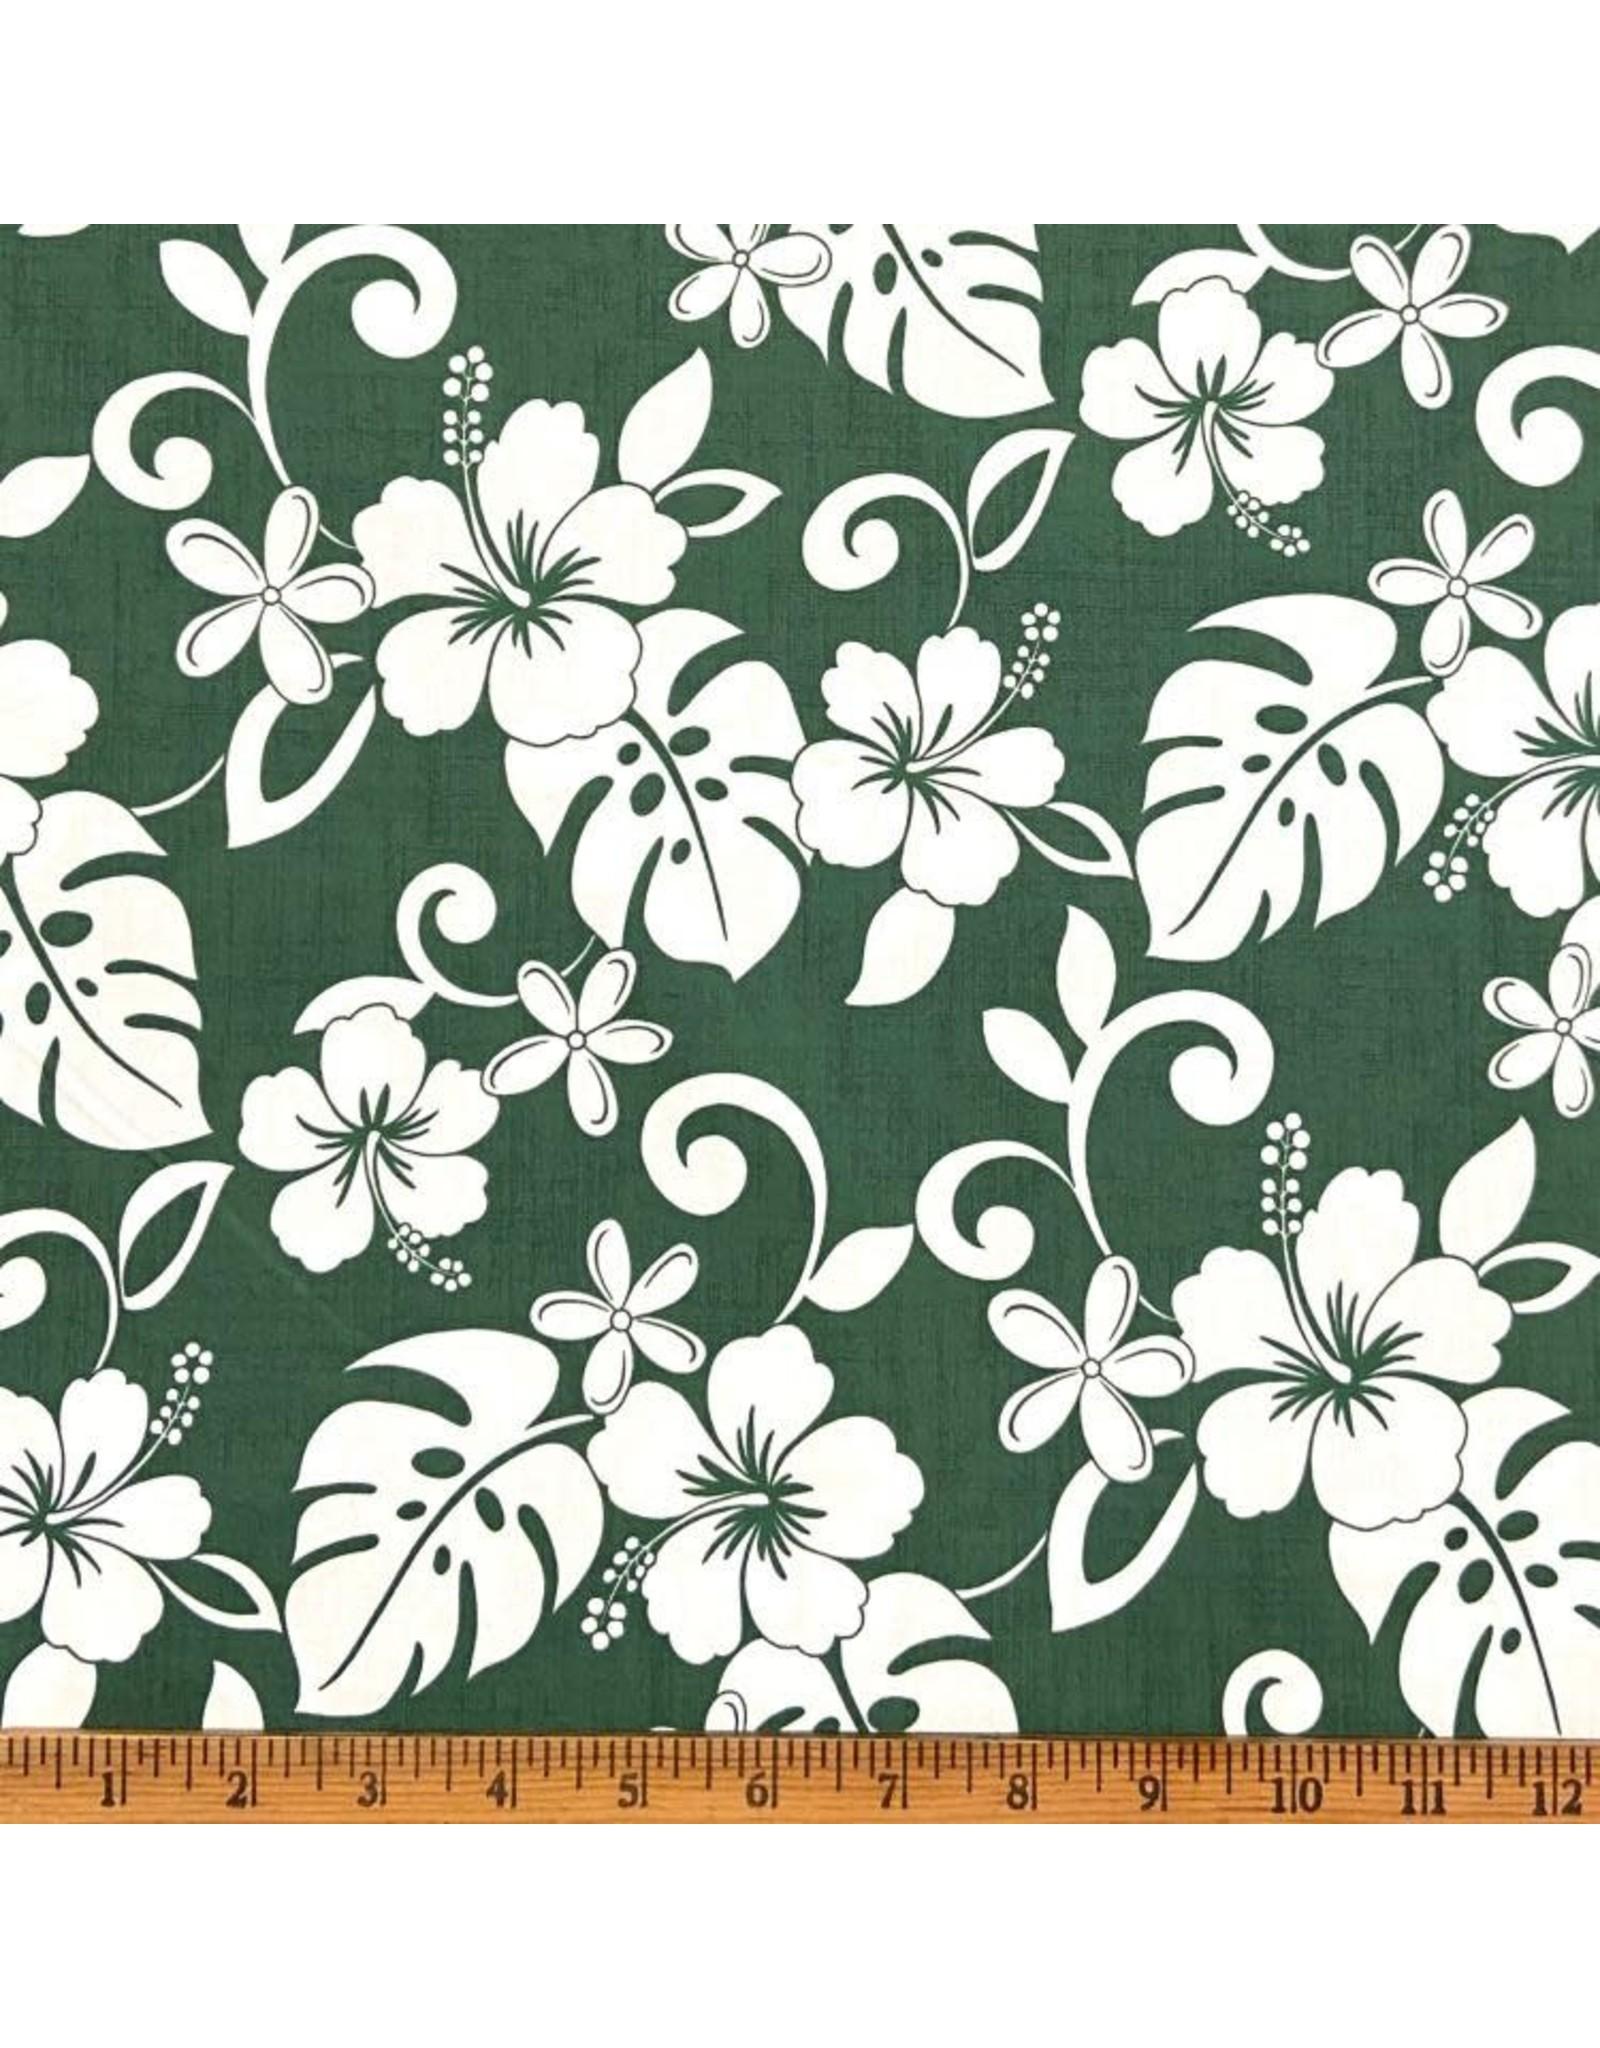 Sevenberry Island Paradise, Classic Hawaiian in Green, Fabric Half-Yards SB-4144-2-4